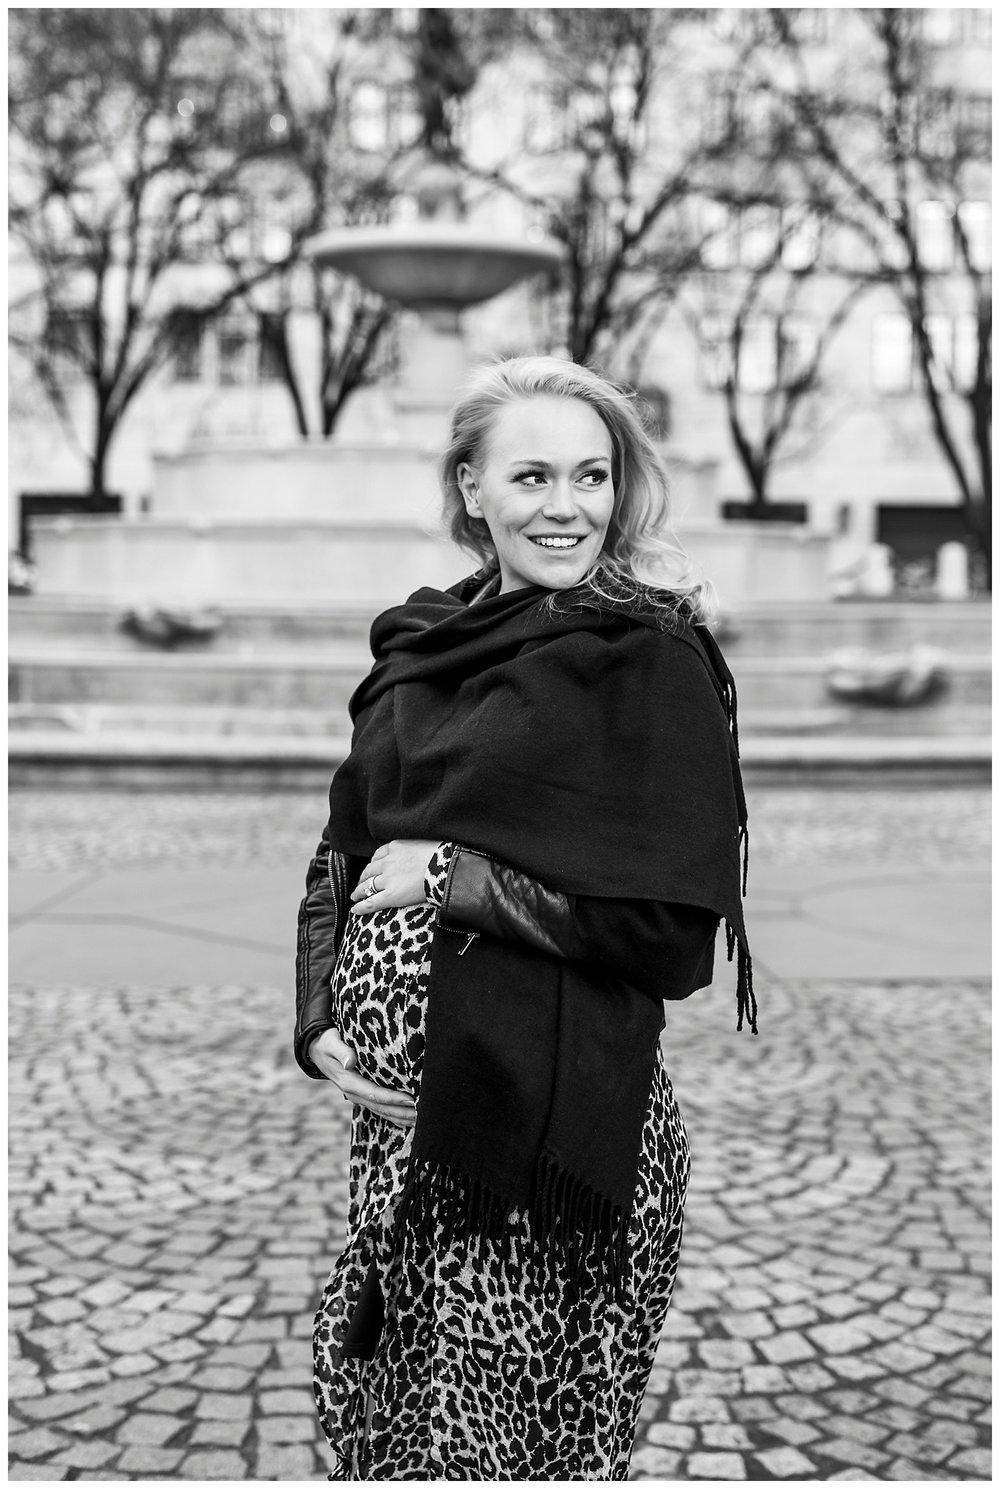 Krista_Maternity_Photos_Central_Park_NYC_Apollo_Fields_99.jpg